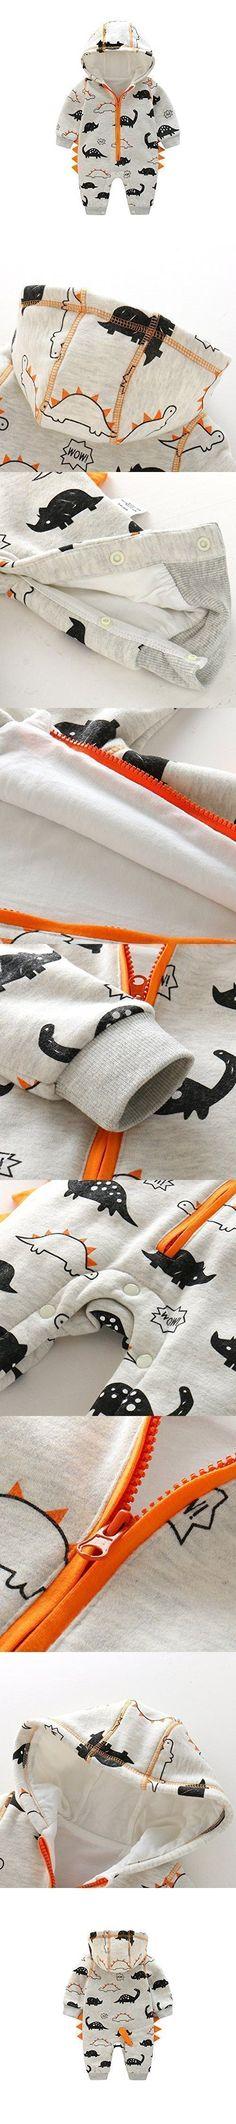 Newborn Baby Boy Baby Girl Unisex Clothes Long Sleeve Dinosaur Hoodies Winter Warm Romper outfit 3-6 months #babyboyhoodies #babygirlhoodie #babyboylongsleeve #babygirlhoodies #babyhoodies #babyboyoutfits #boyoutfits